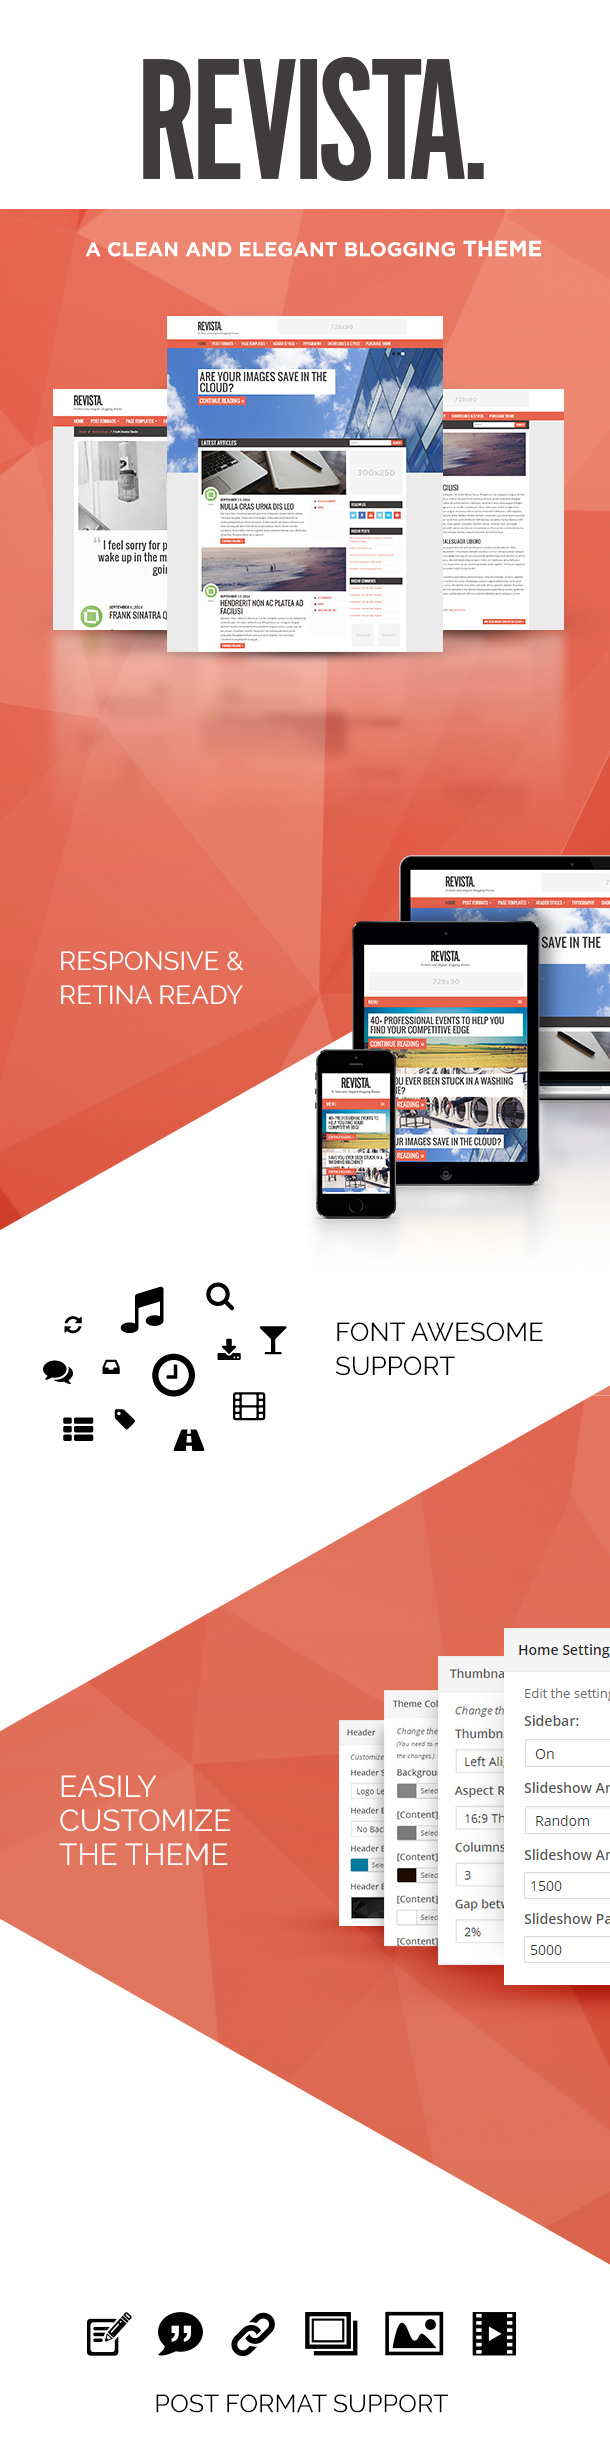 Studio - Clean And Minimal Portoflio WordPress Theme